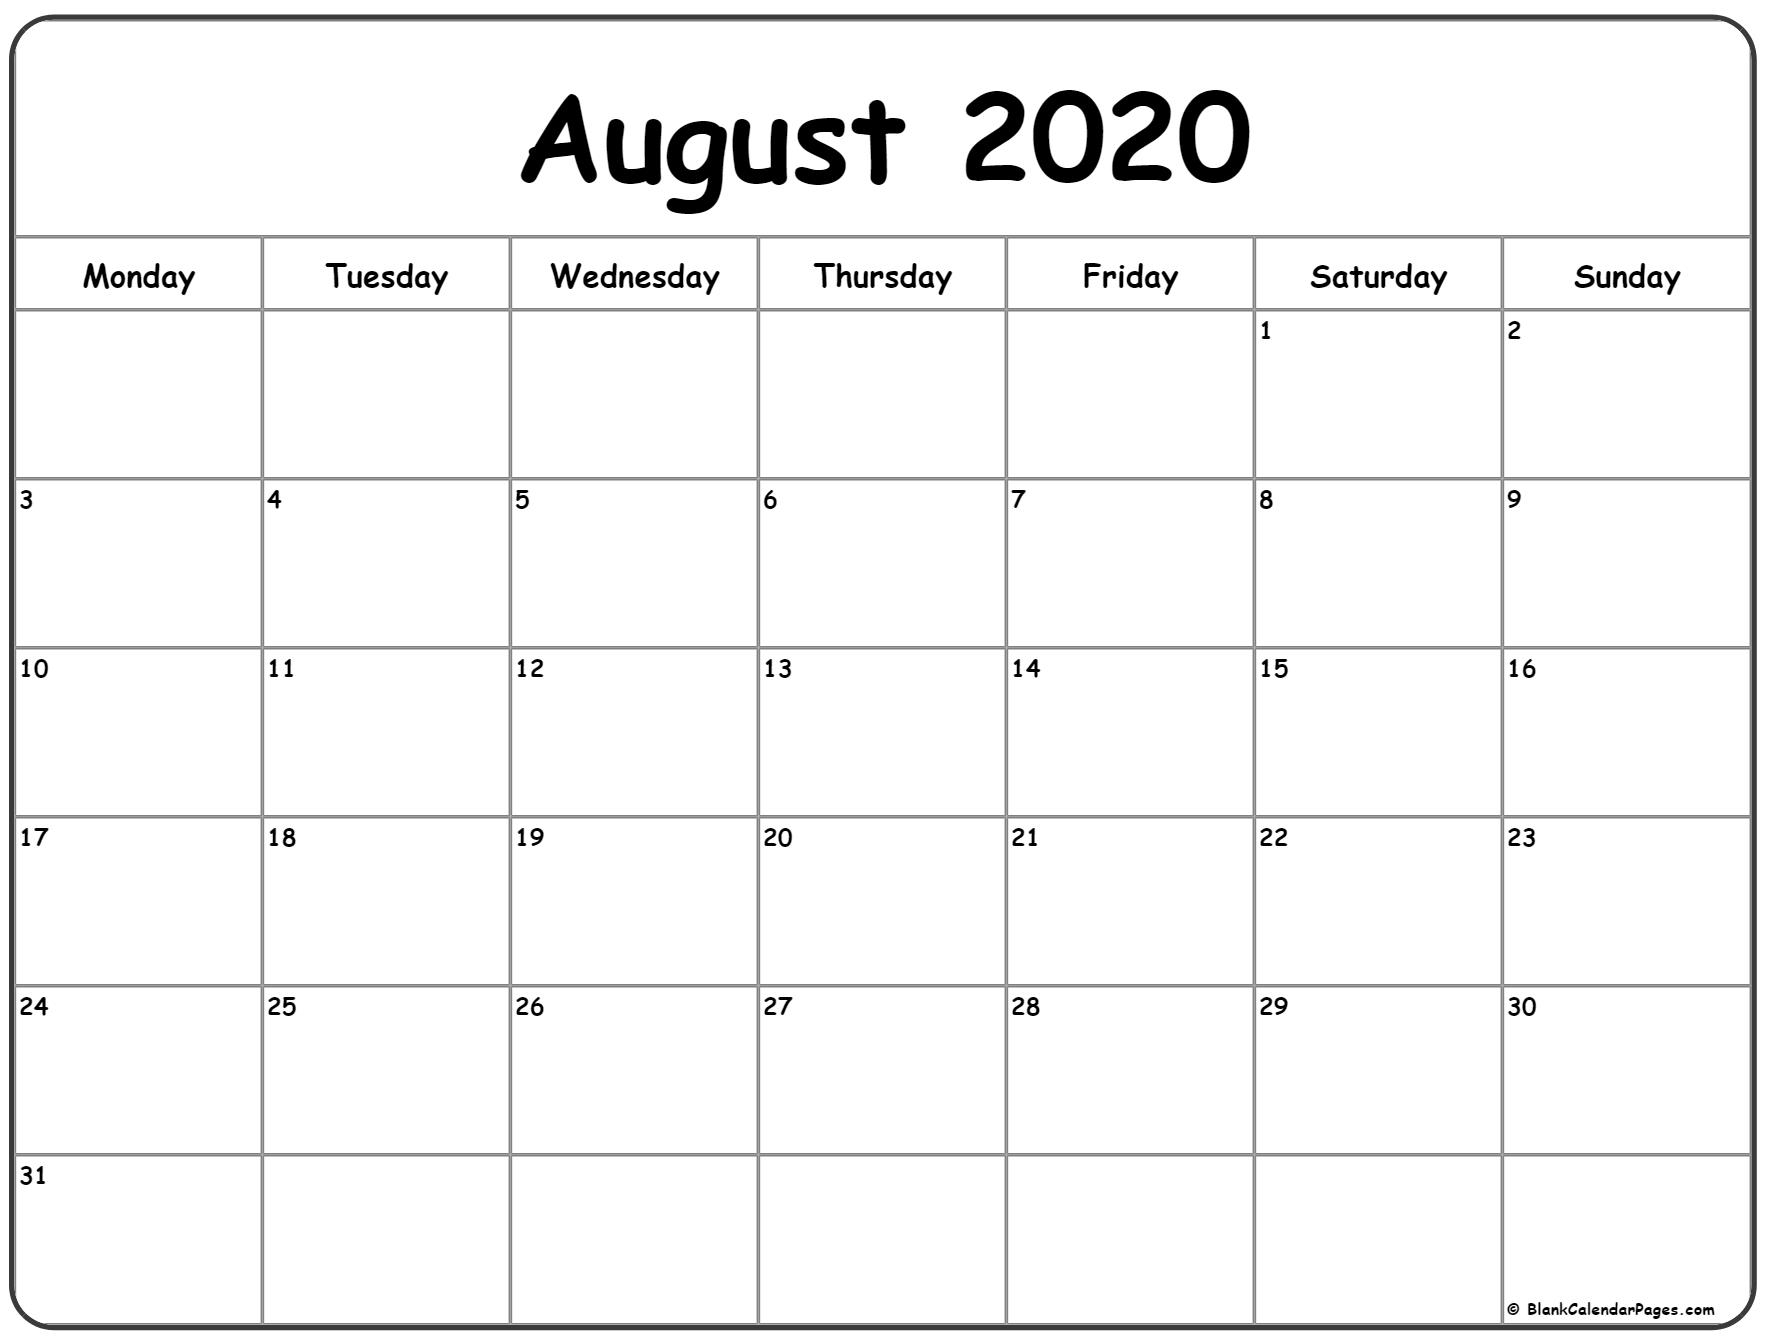 August 2020 Monday Calendar | Monday To Sunday within Sunday Through Saturday Calendar